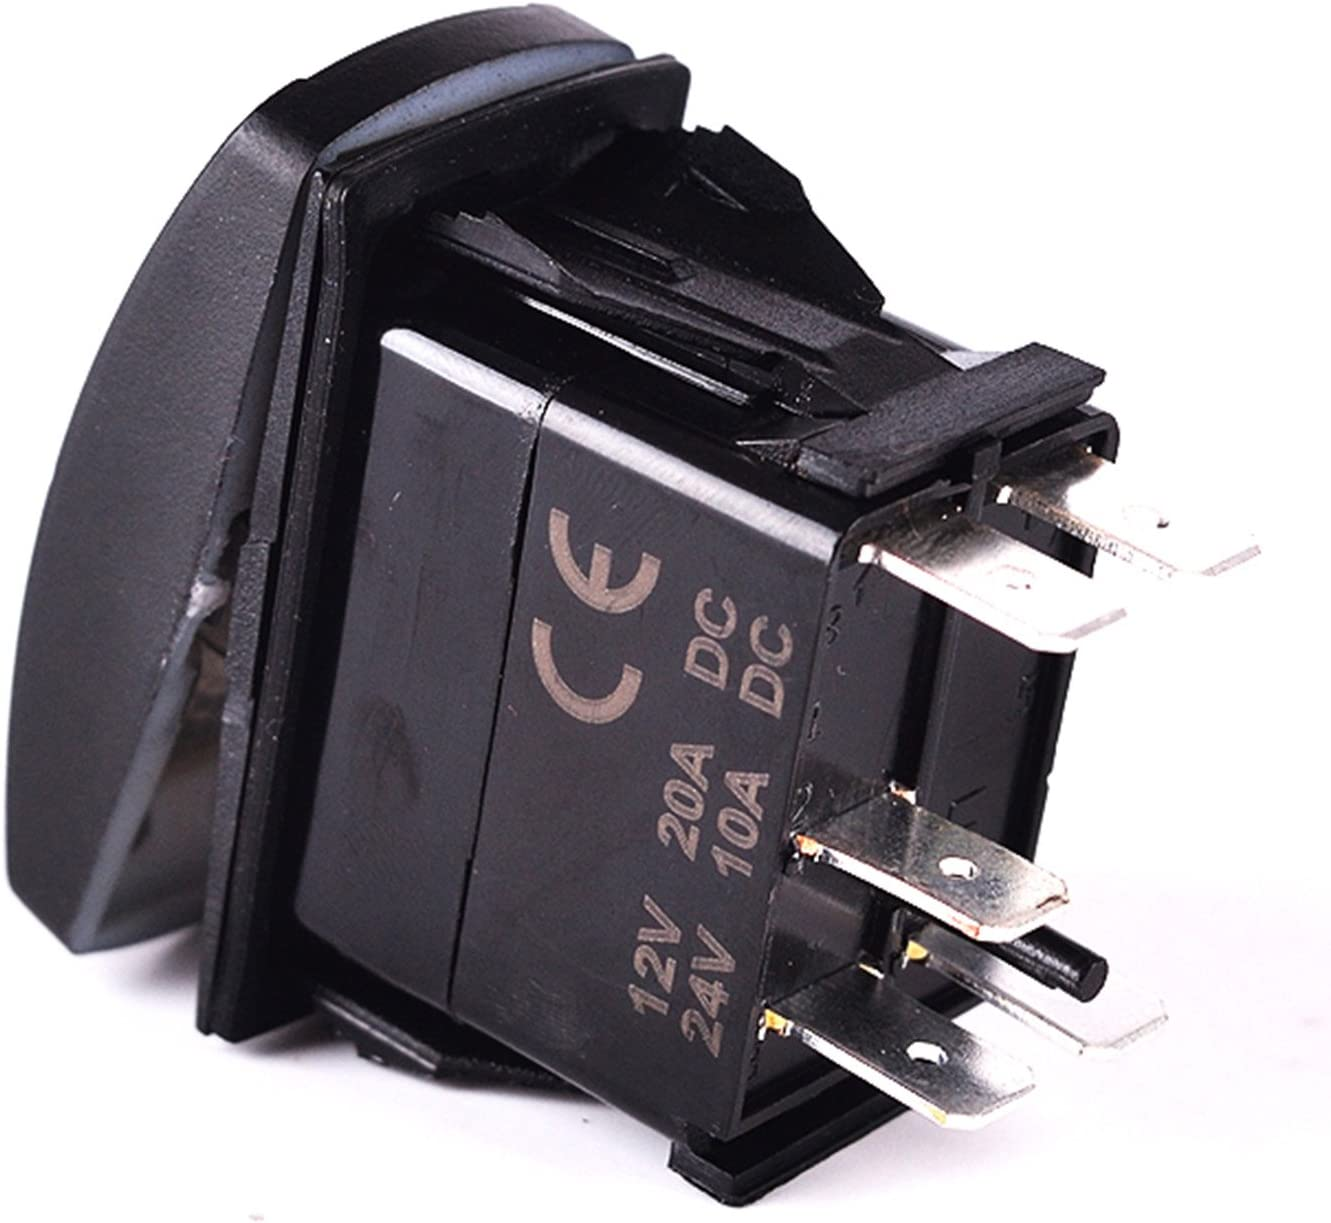 SLR1152BLPFBA Blue Laser Rocker Switch Backlit ACCESSORIES 12V Bright Light Powersports